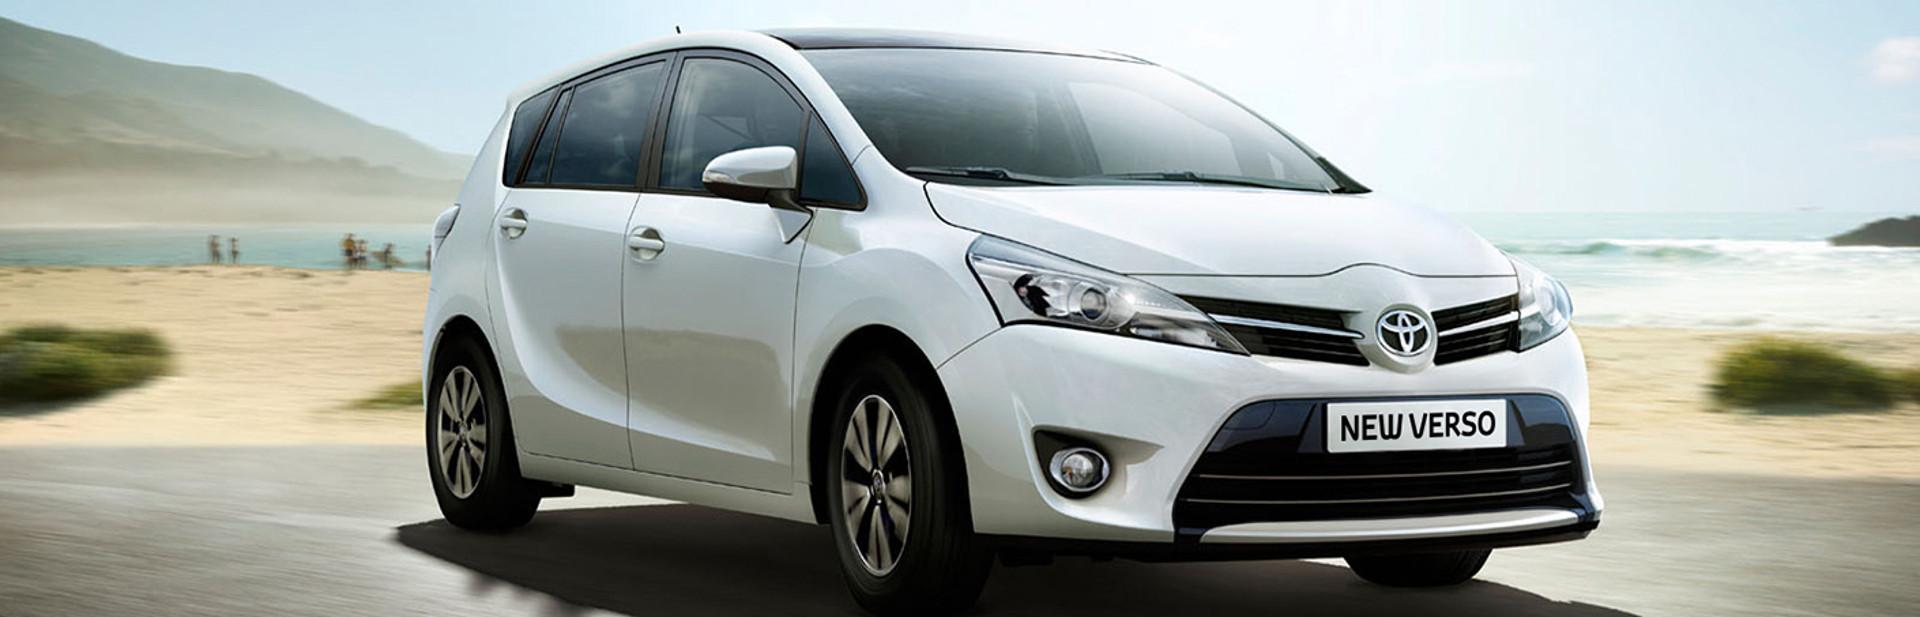 Toyota Verso Cab Direct 2015 Interior